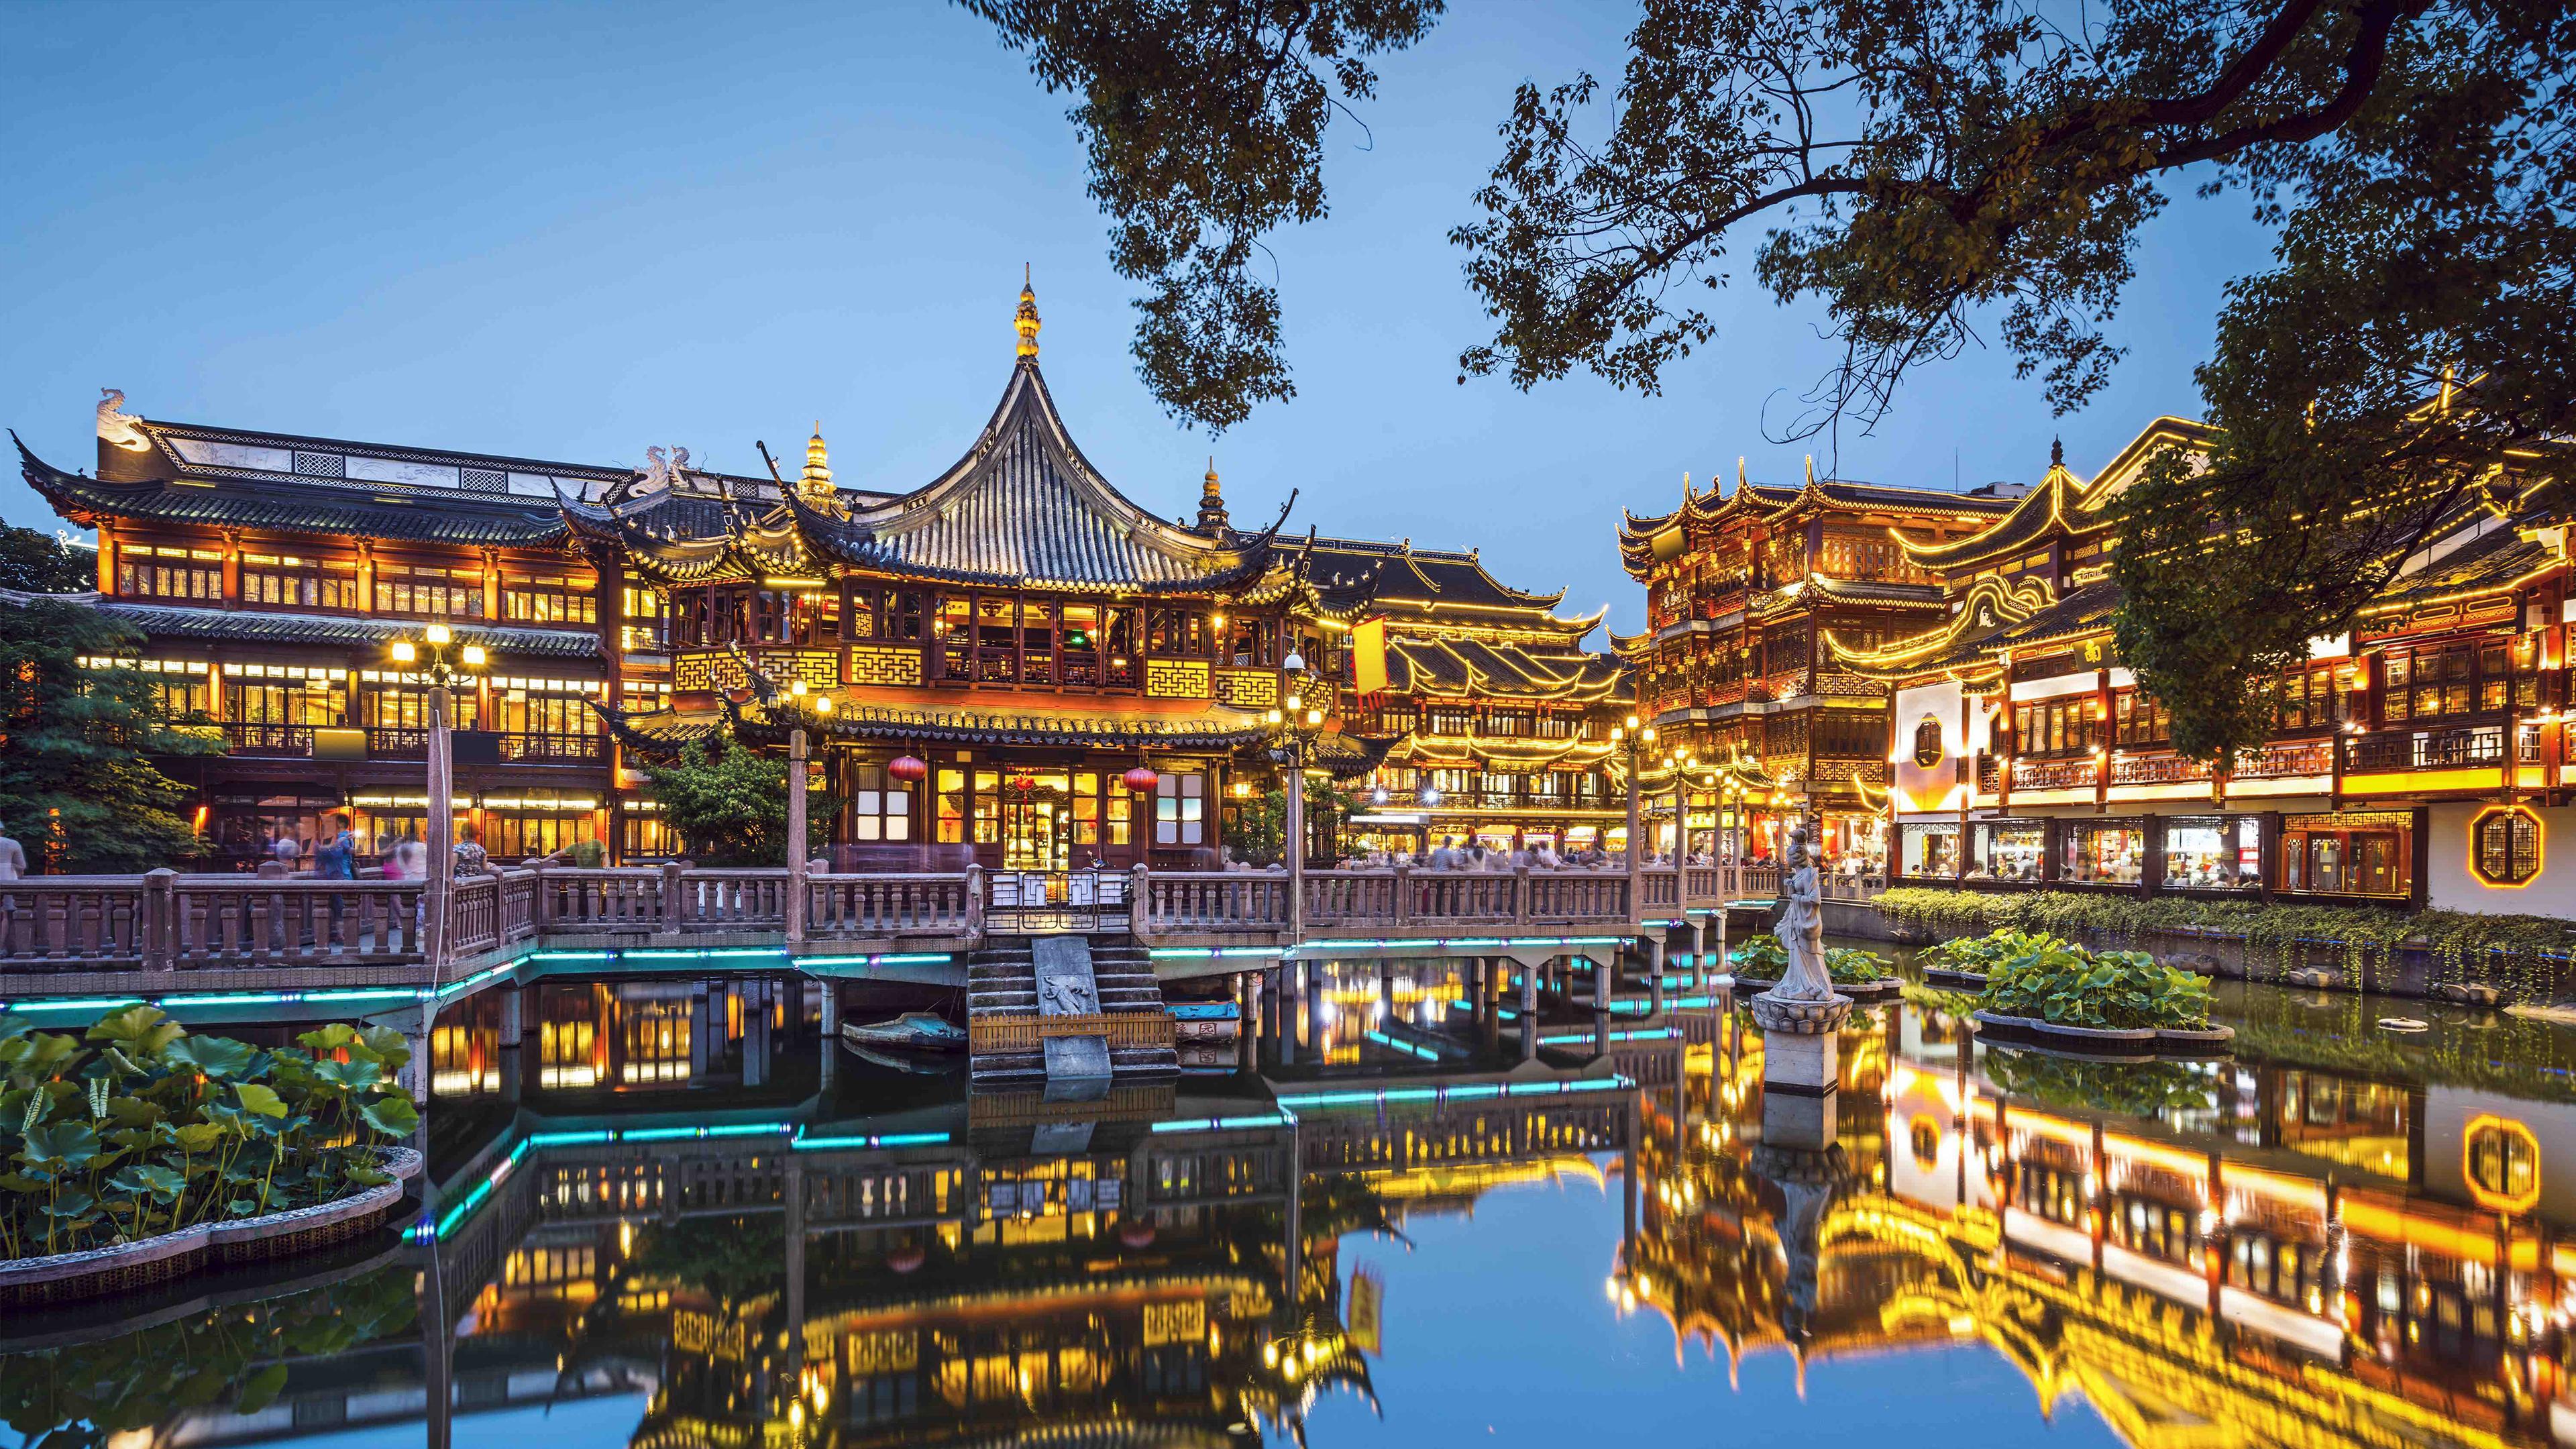 4k China Wallpaper Spill China Travel 1917449 Hd